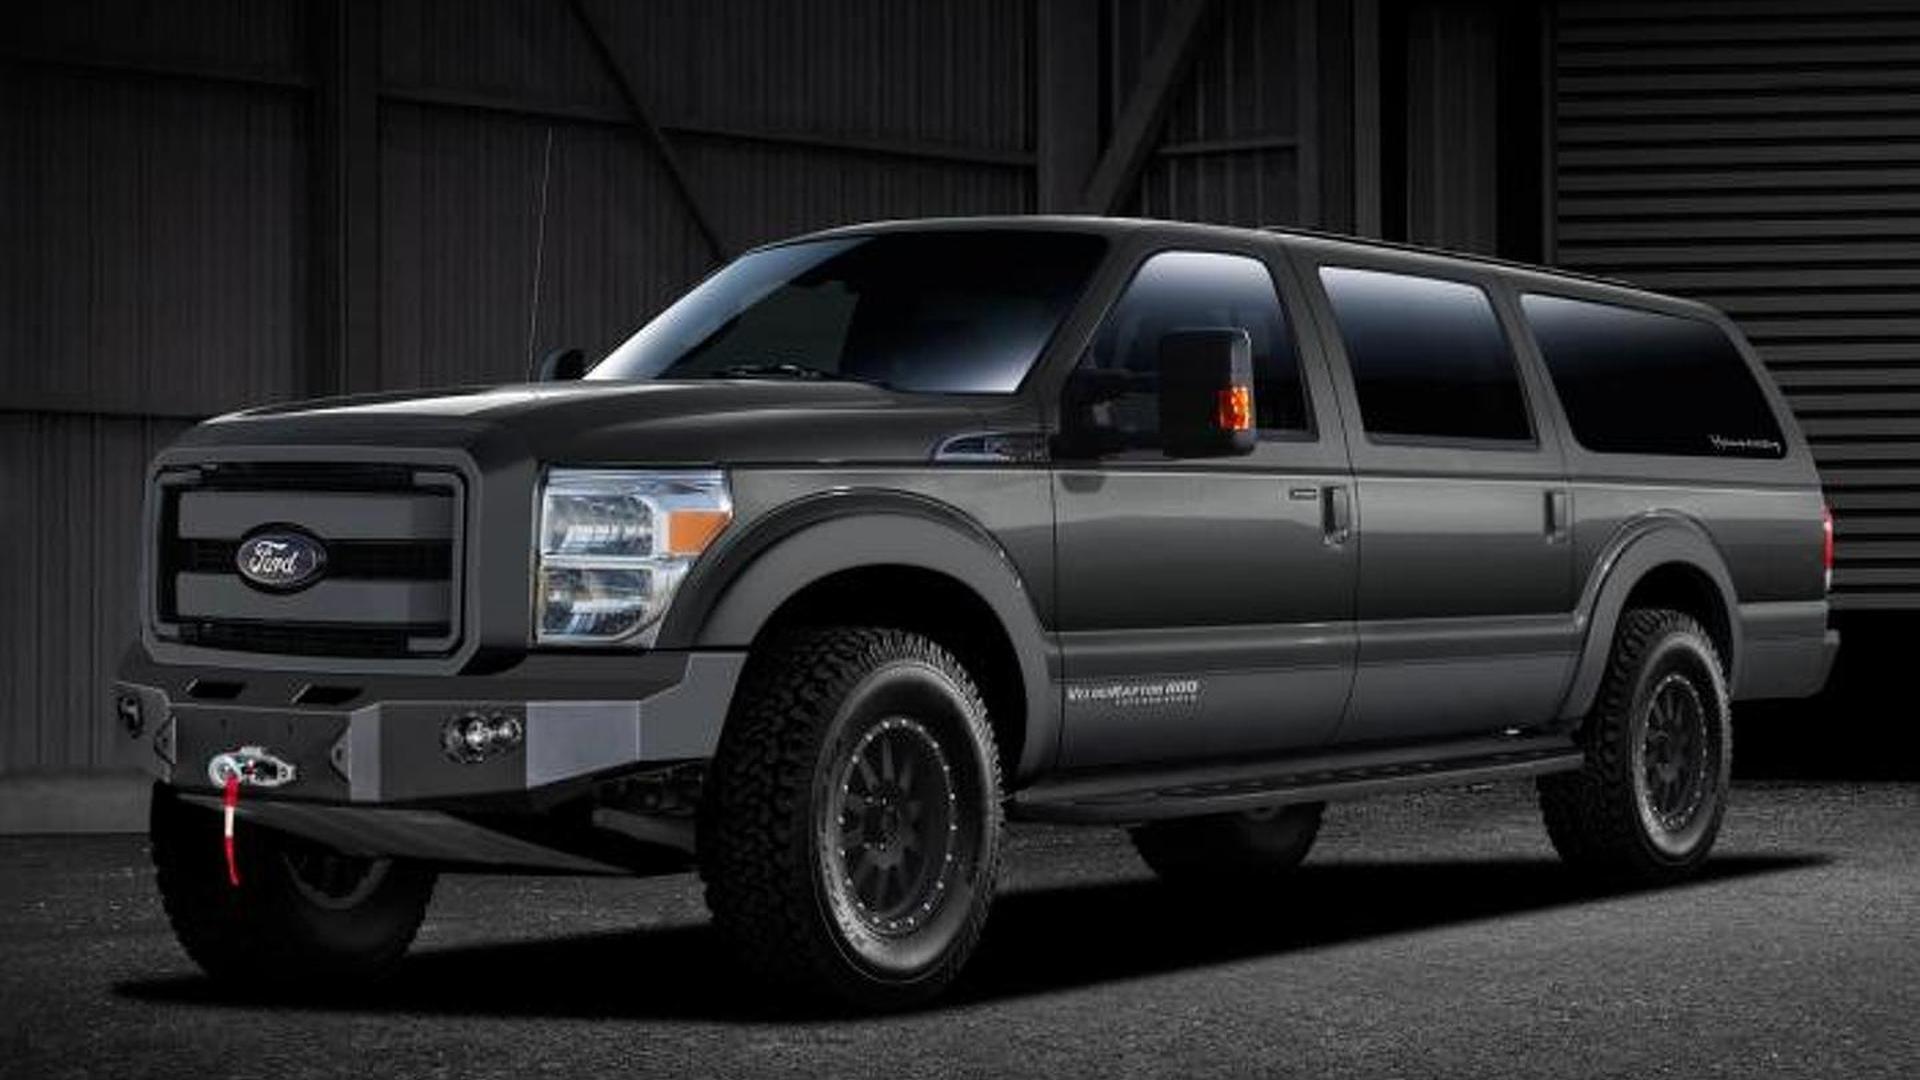 Hennessey VelociRaptor SUV unveiled